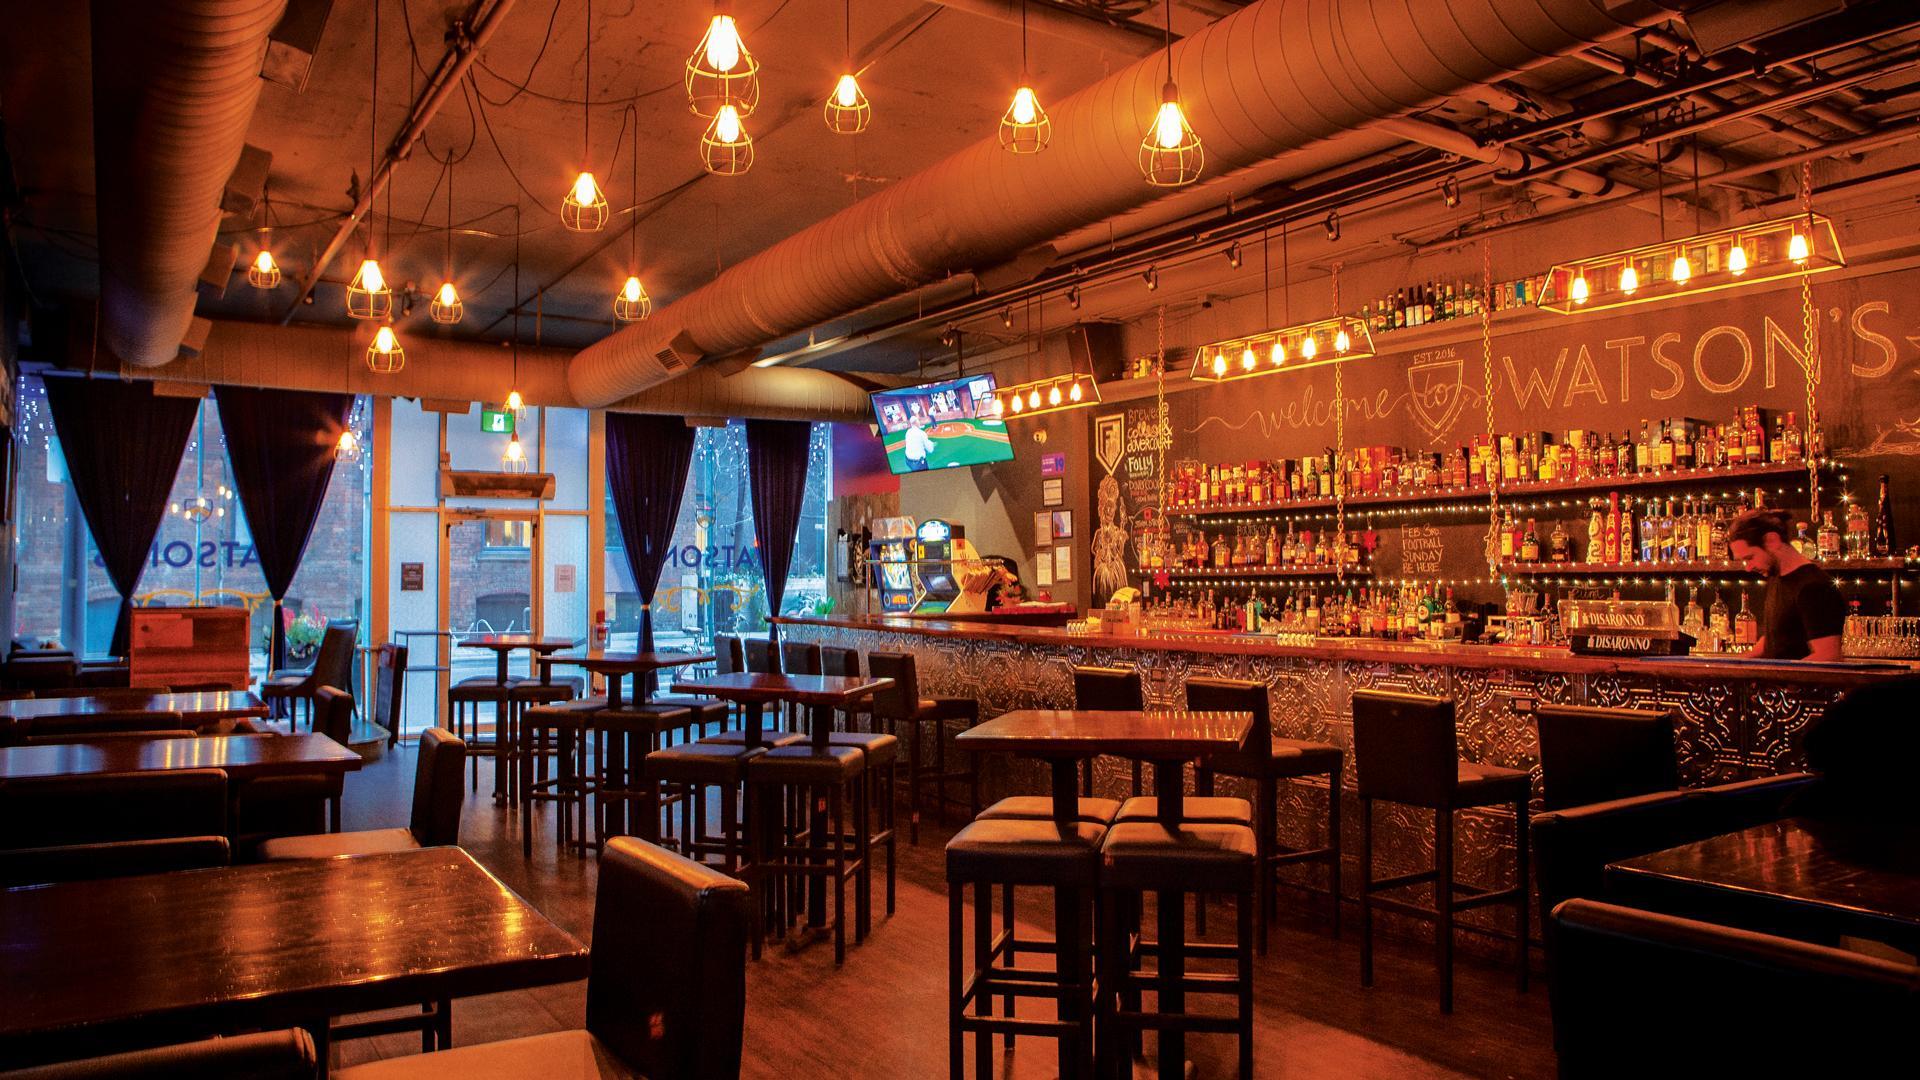 Toronto bars: Watson's